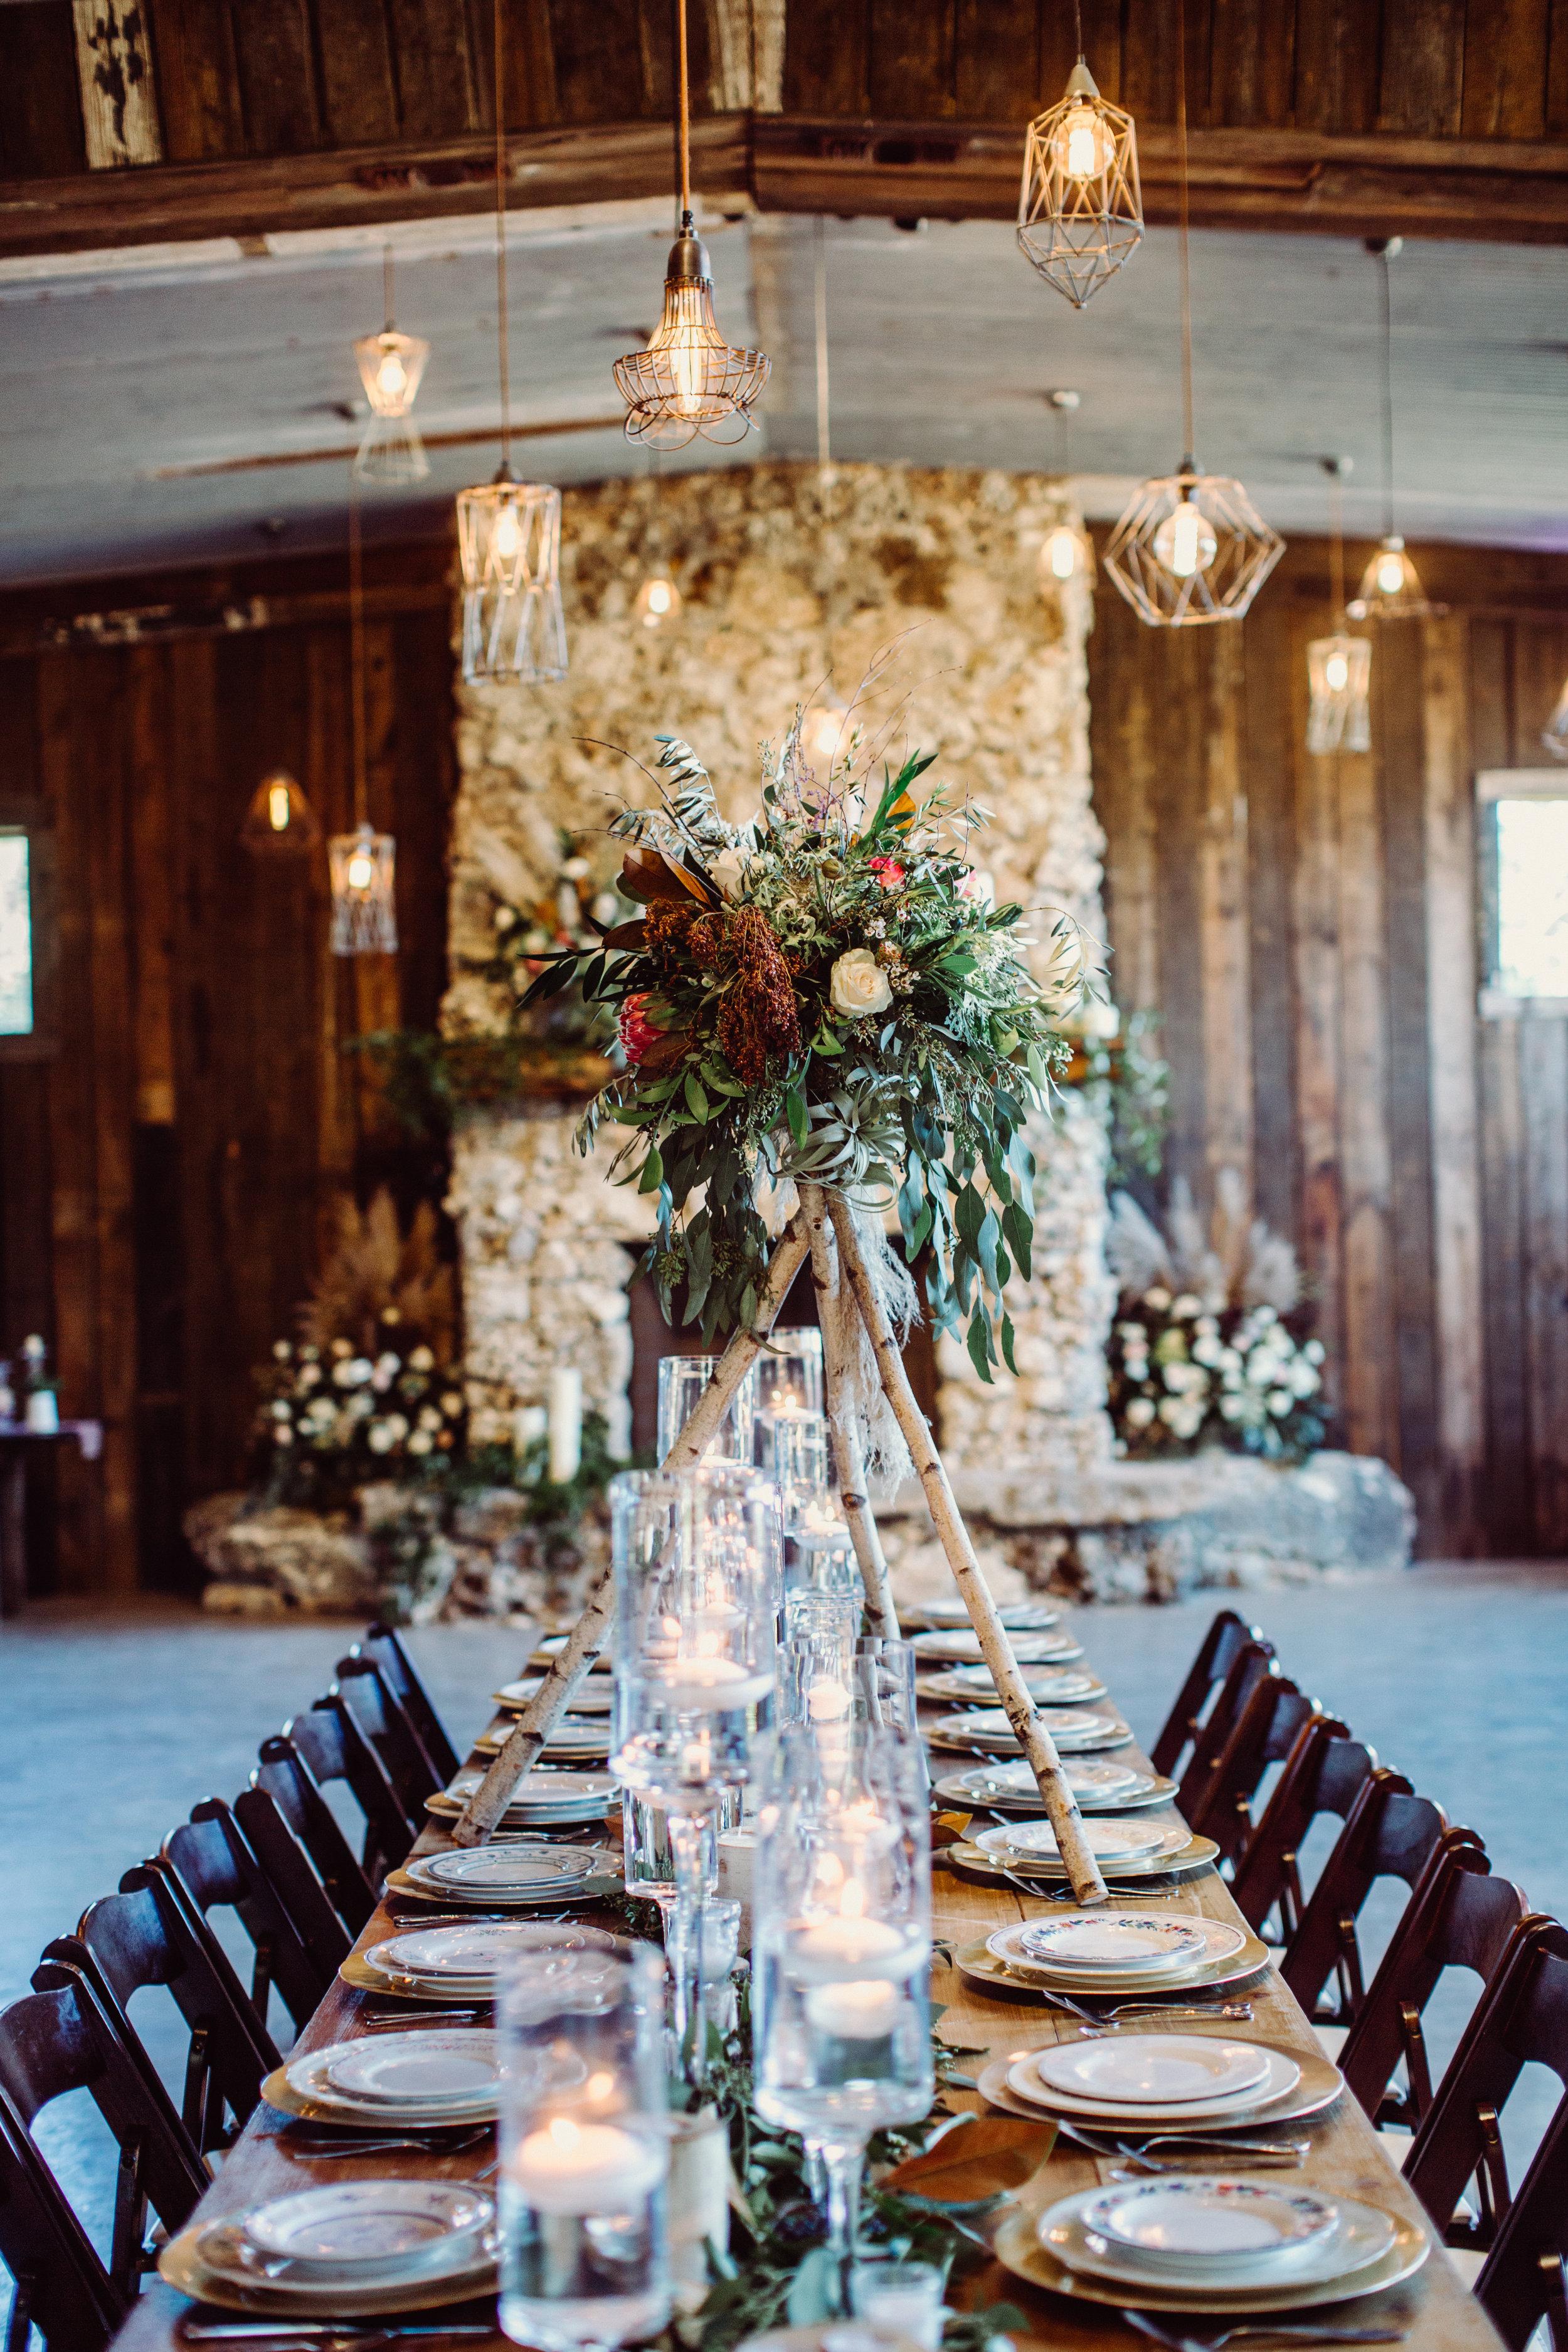 the-creek-haus-austin-texas-wedding-venue-destination-austin-texas-lodging-winter-open-house-petal-pushers-jona-christina-photography